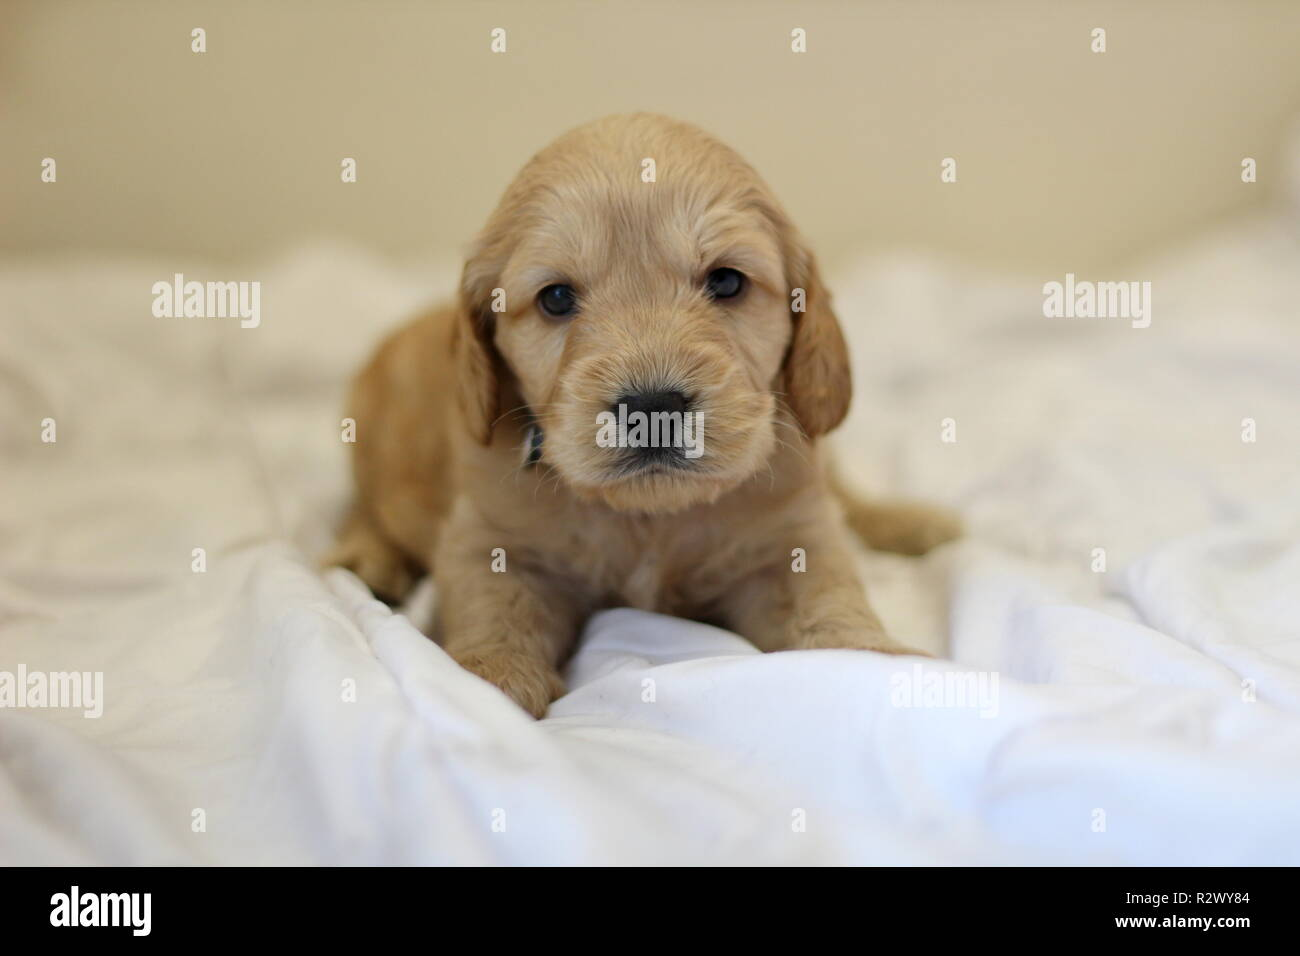 Cockapoo Puppy - Stock Image